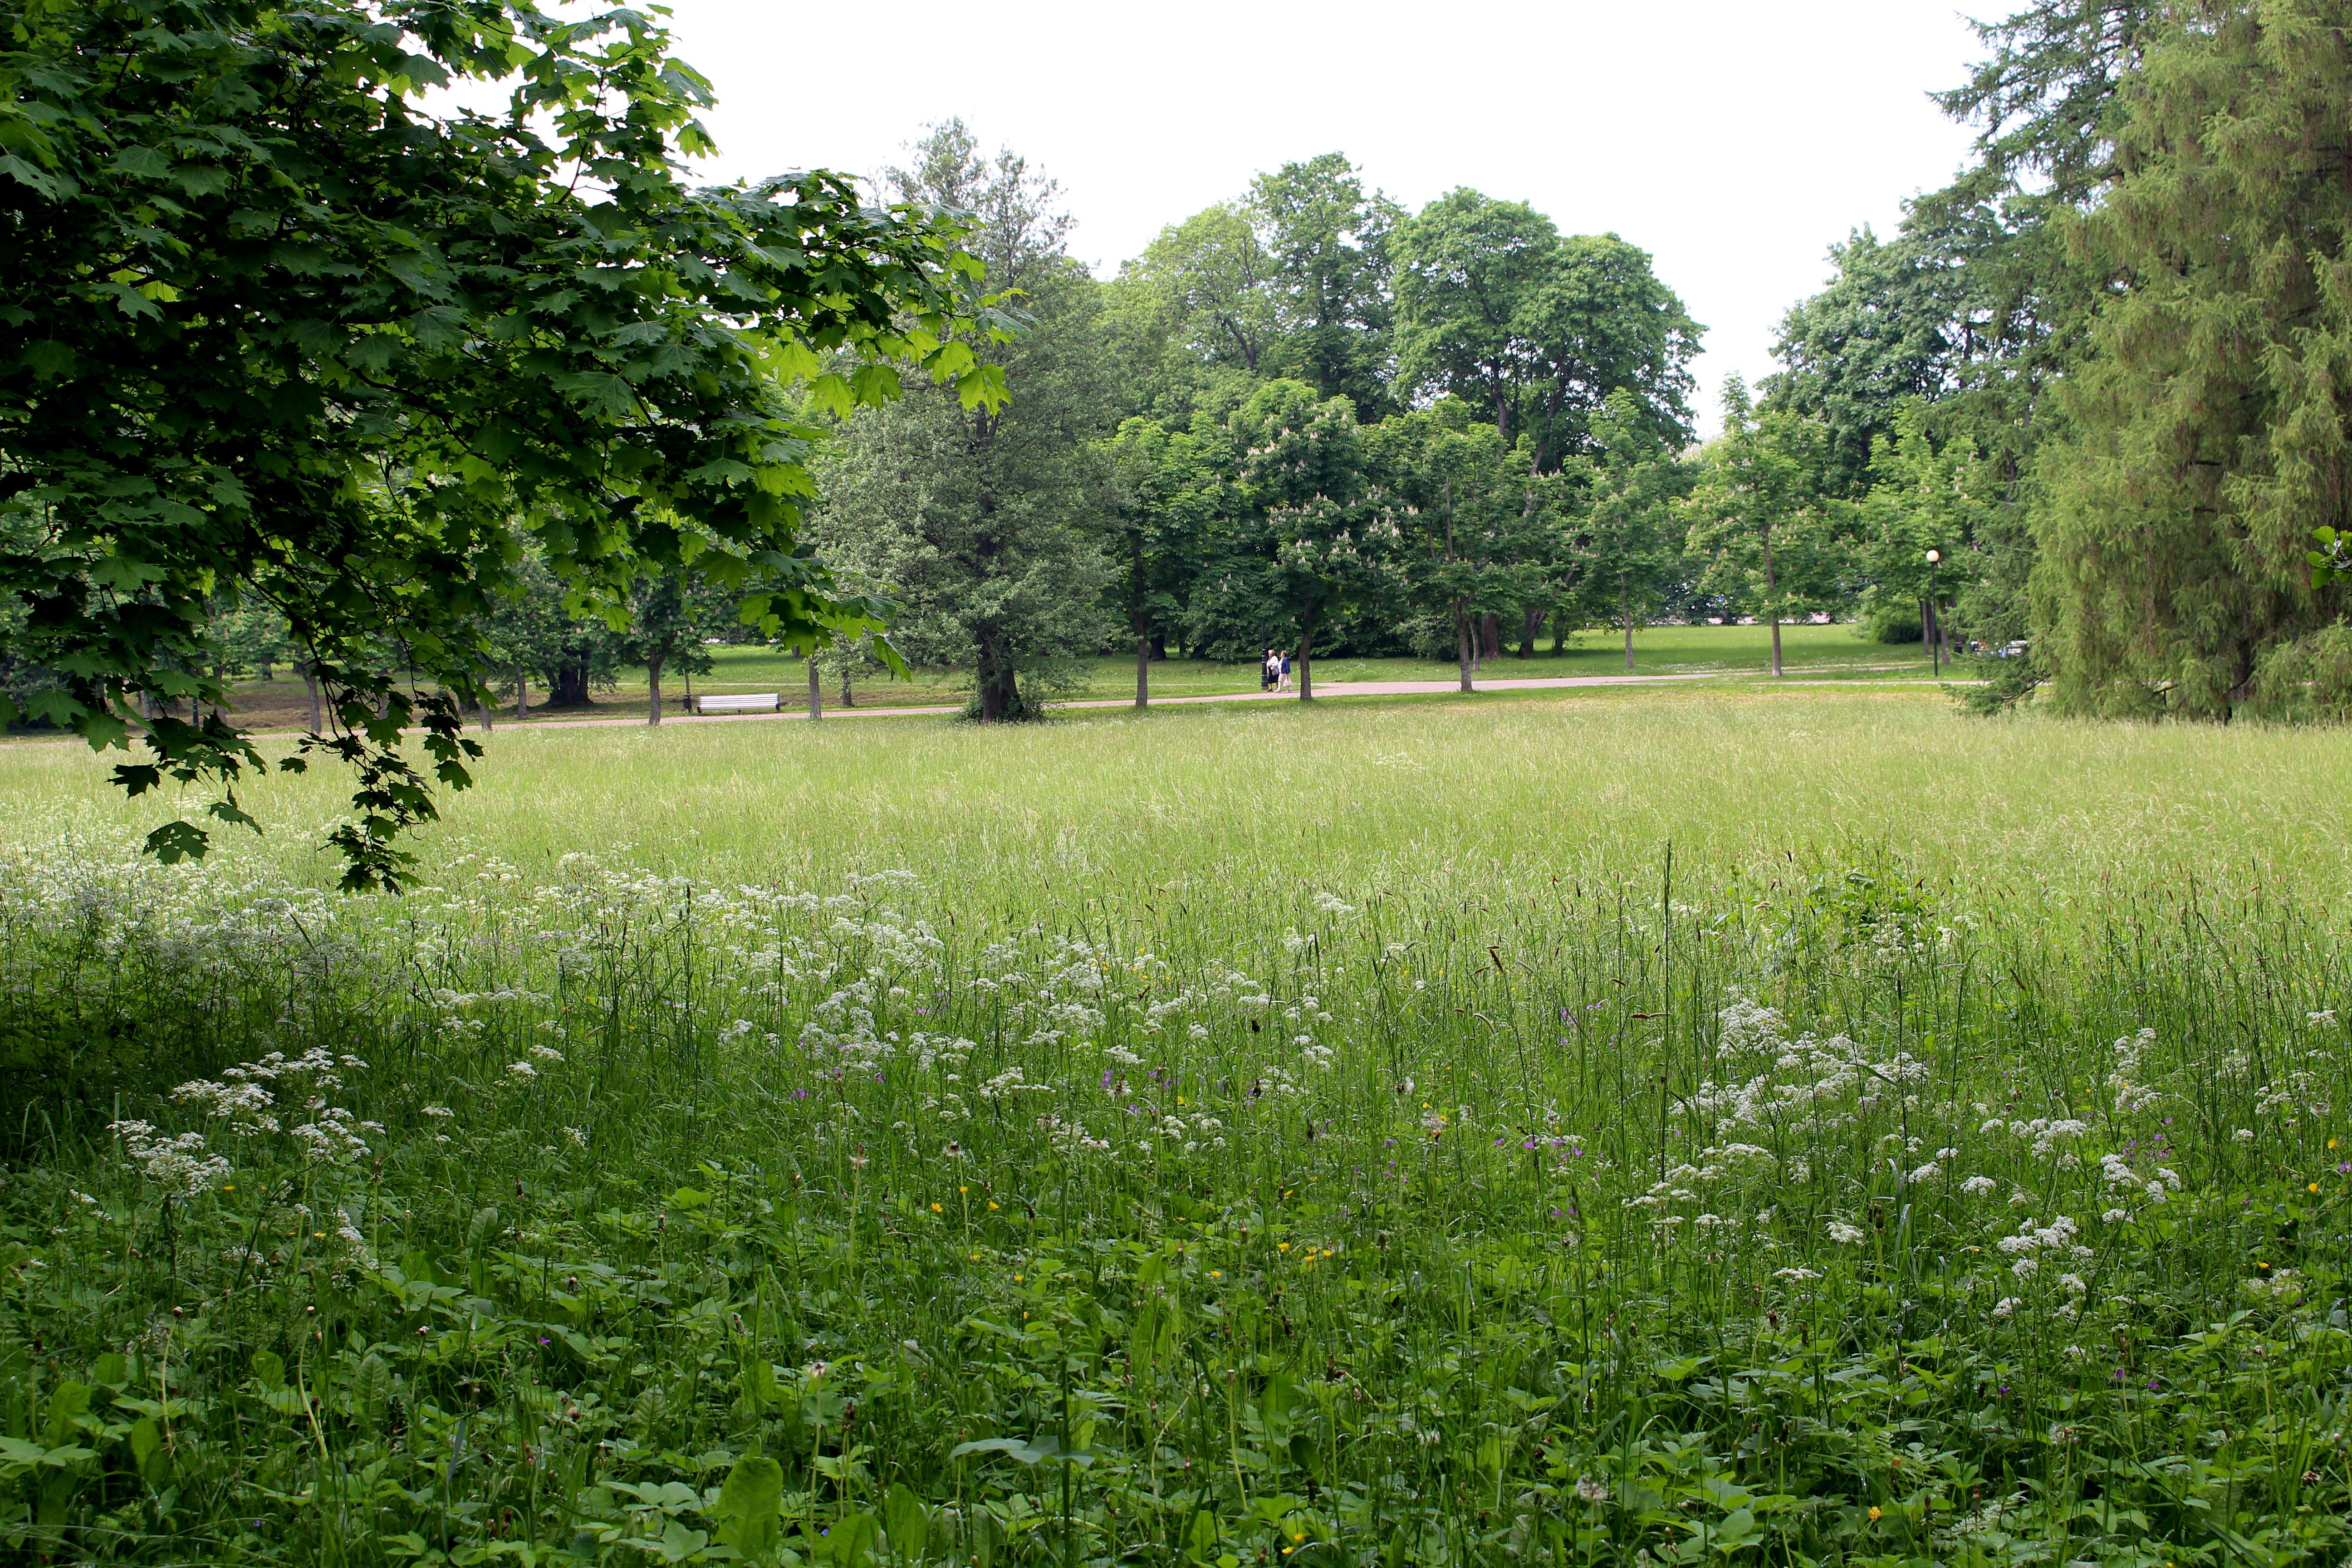 Kadriorg: The People's Park - Landscape NotesLandscape Notes